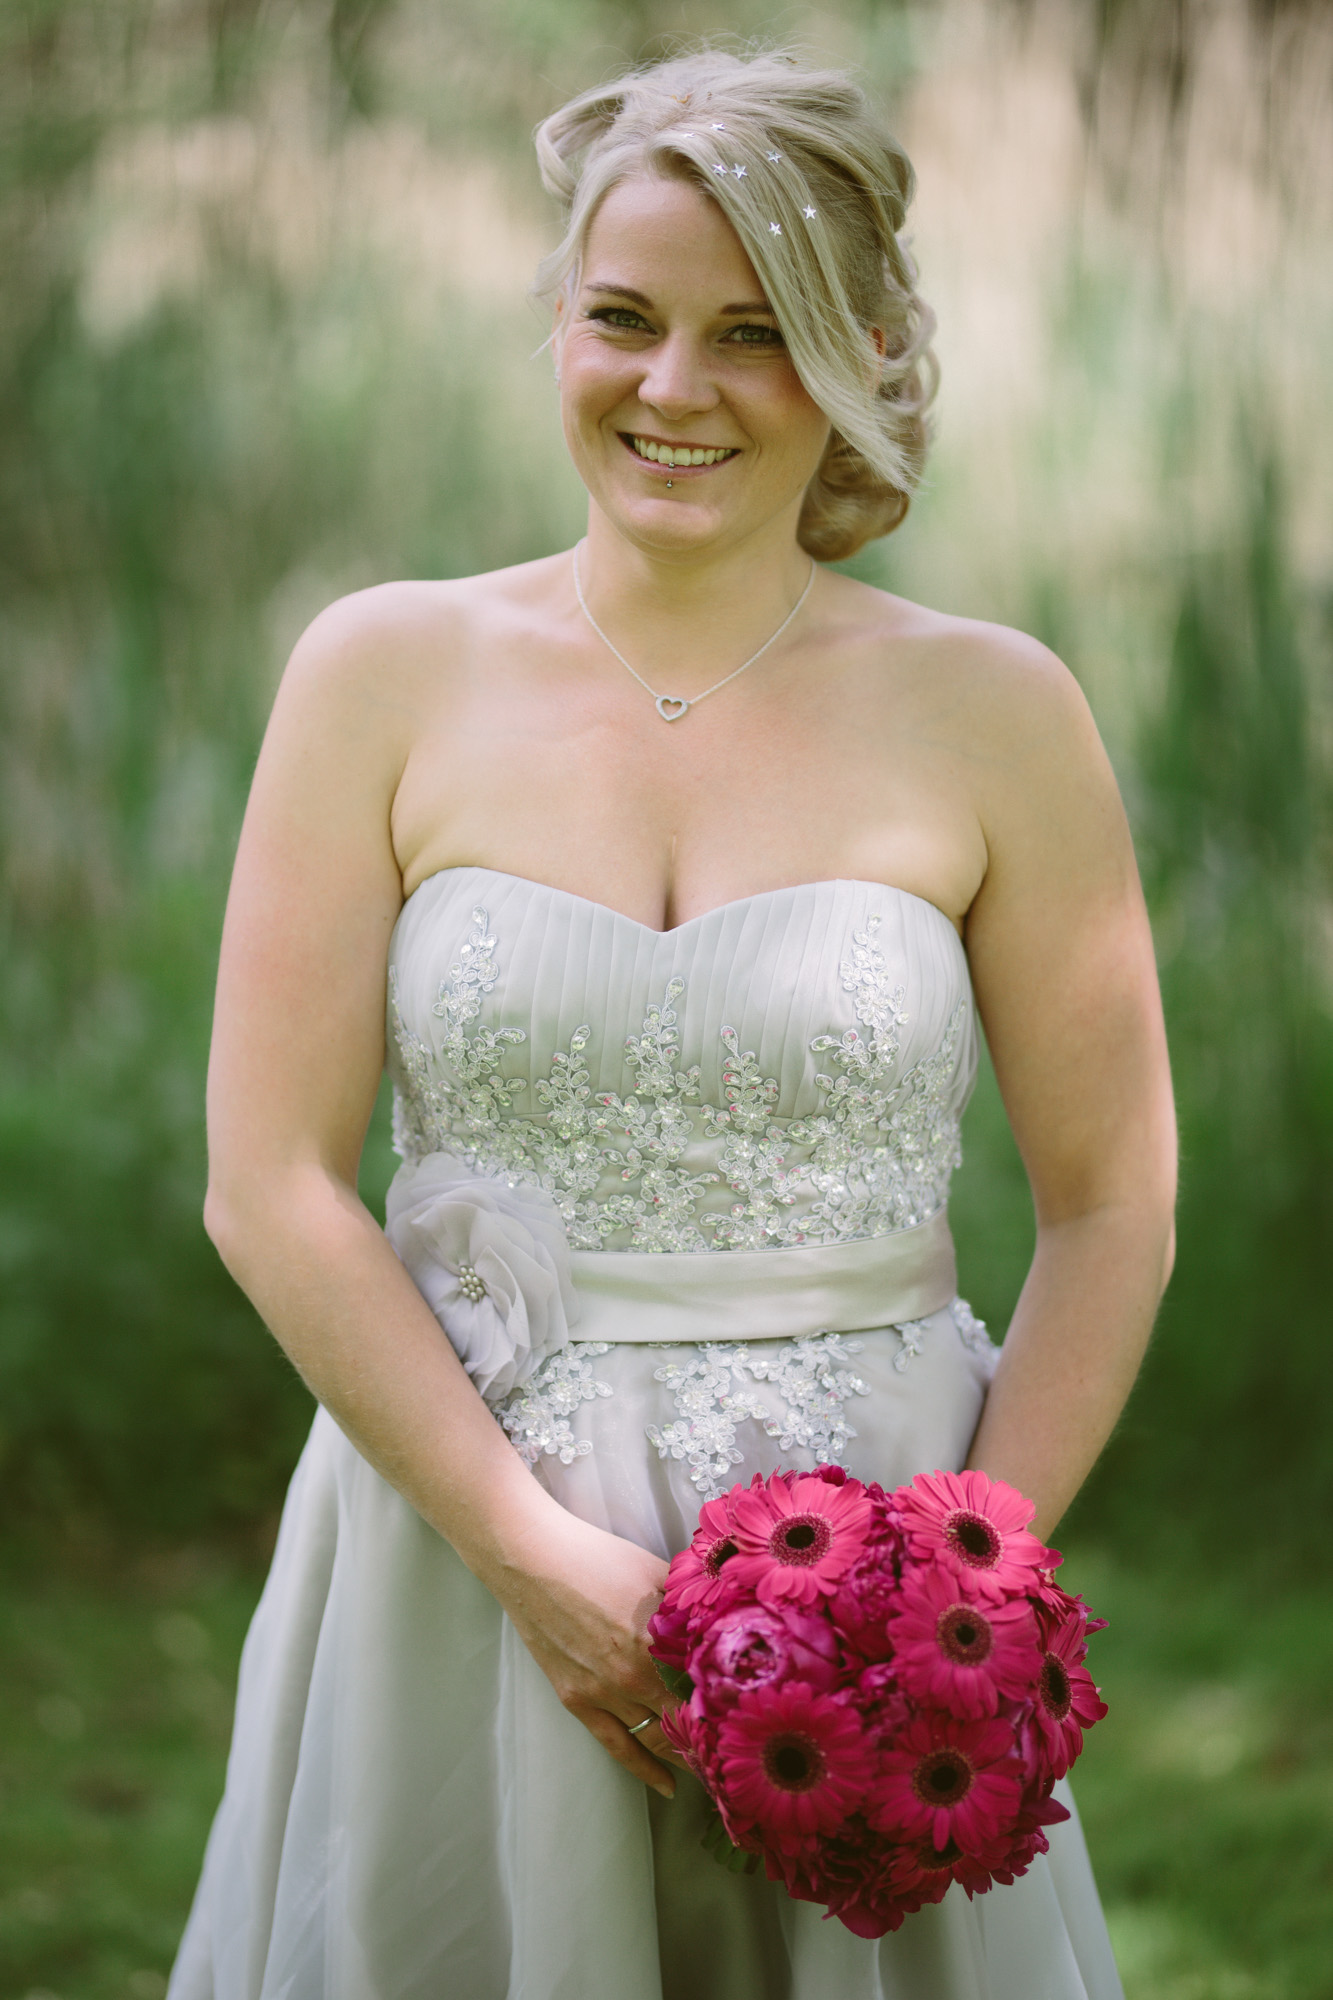 Claudia-Krawinkel-Hochzeitsfotografie-Essen-Duisburg-Standesamt-Schloss-Borbeck-39